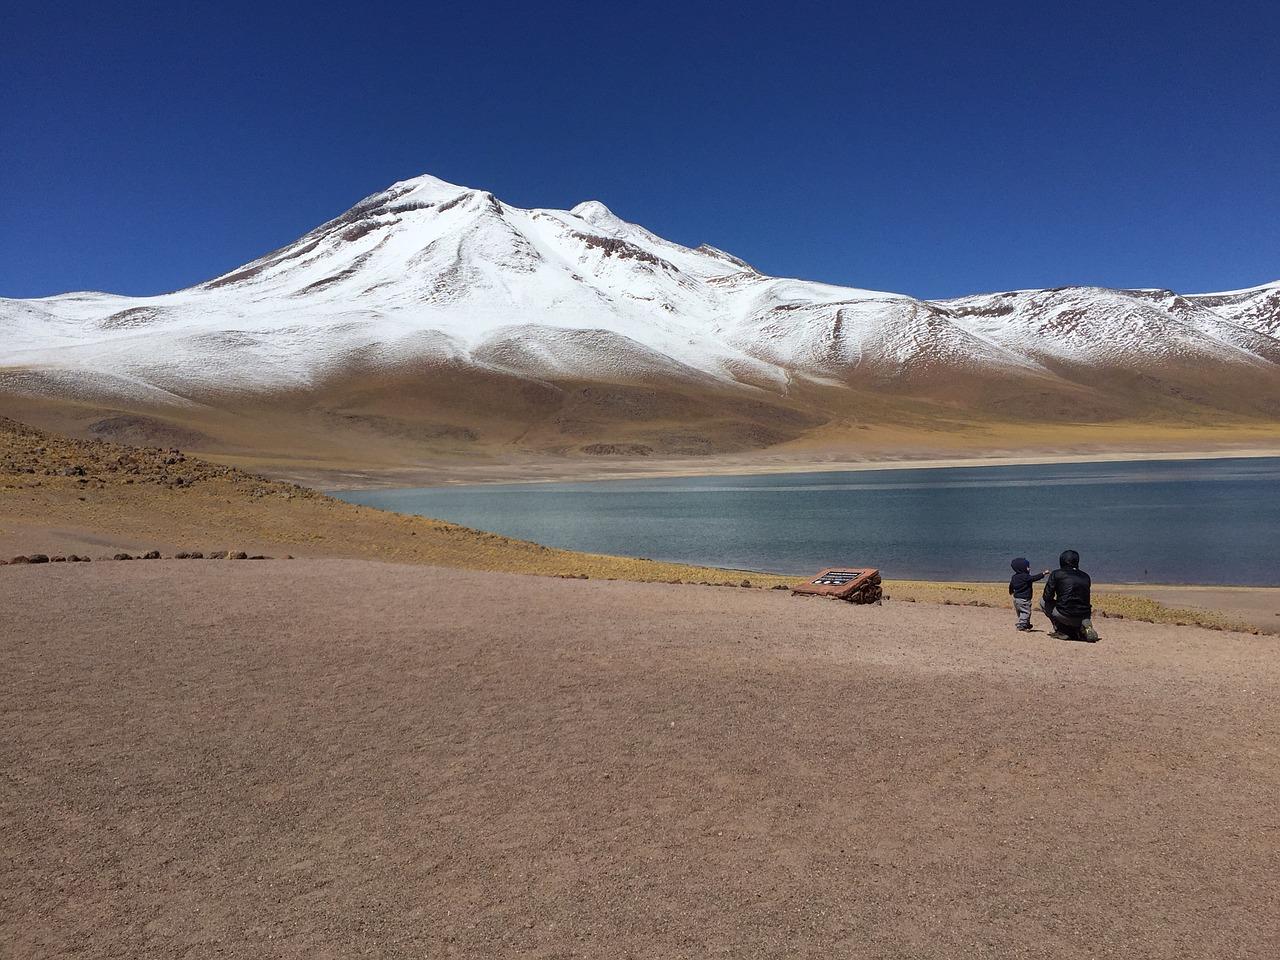 Altiplanica_Chile_Reise_Schnee